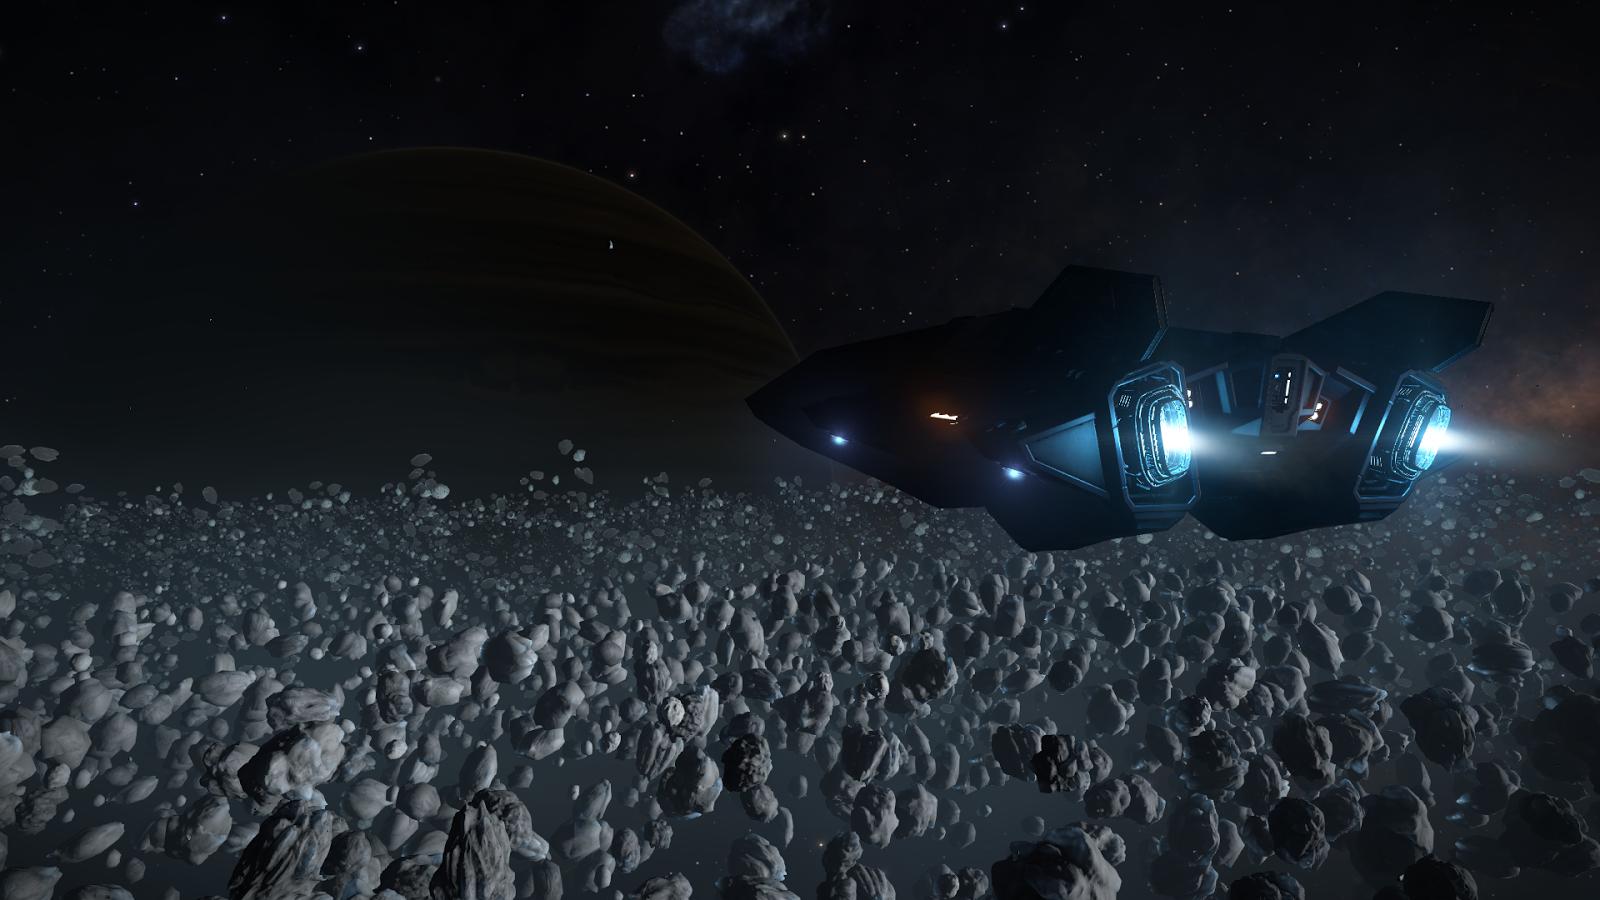 PLEIADES NEBULA  Space Engine